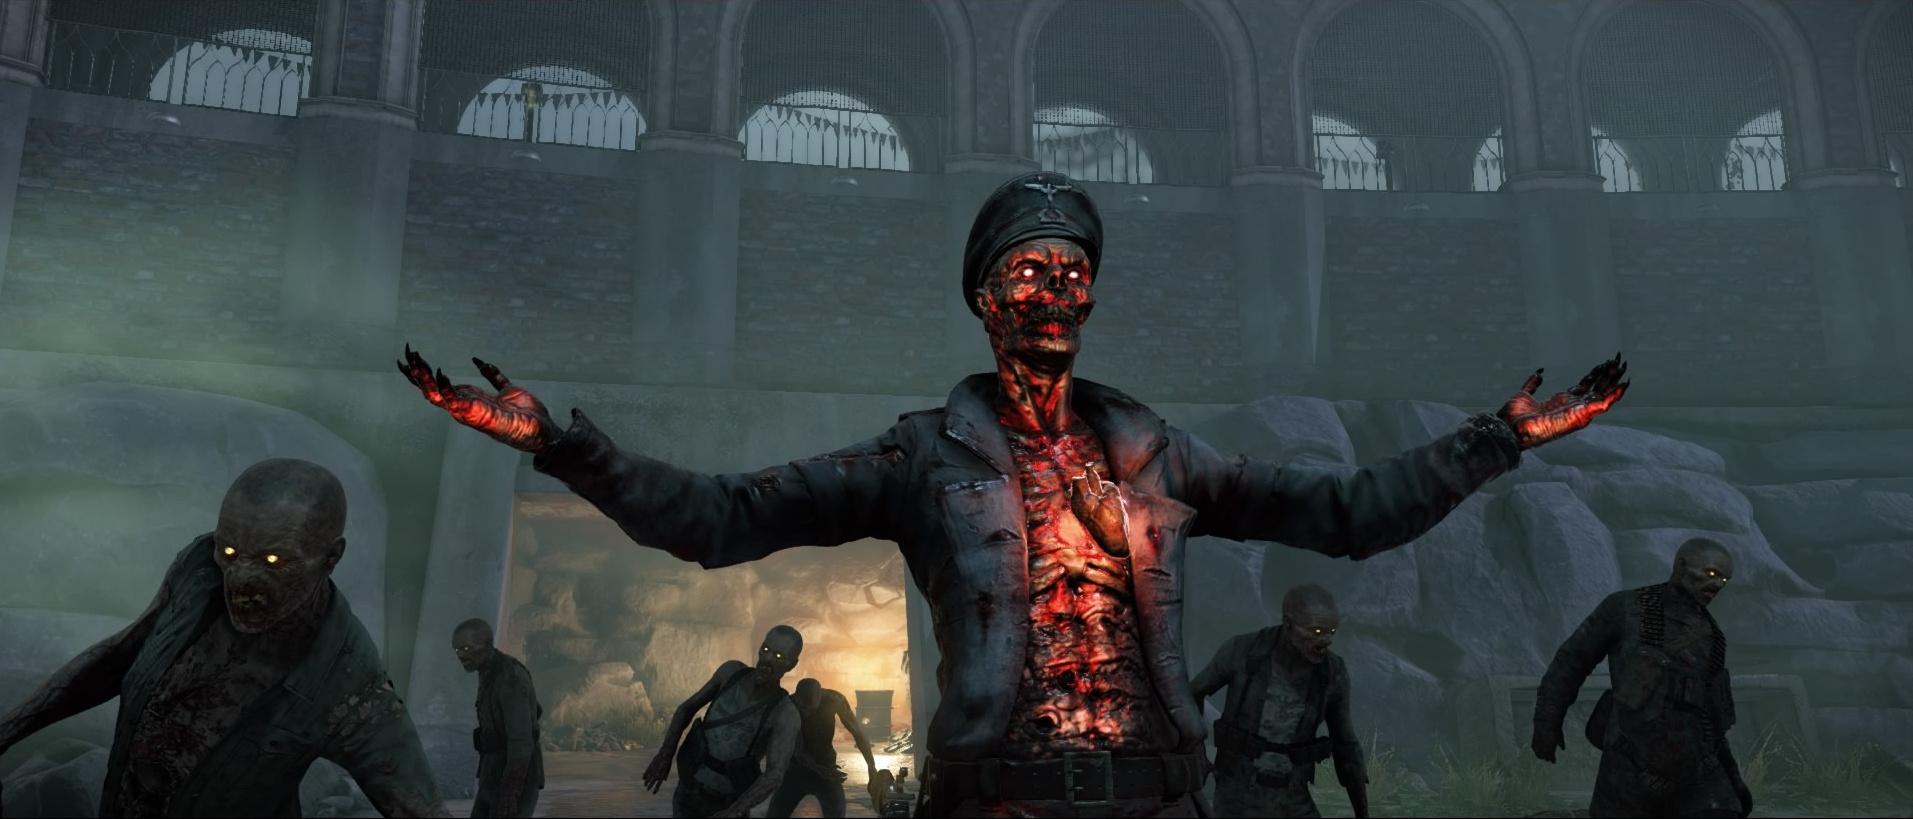 Zombie Army4 улучшат для PS5 и Xbox Series — детали апдейта